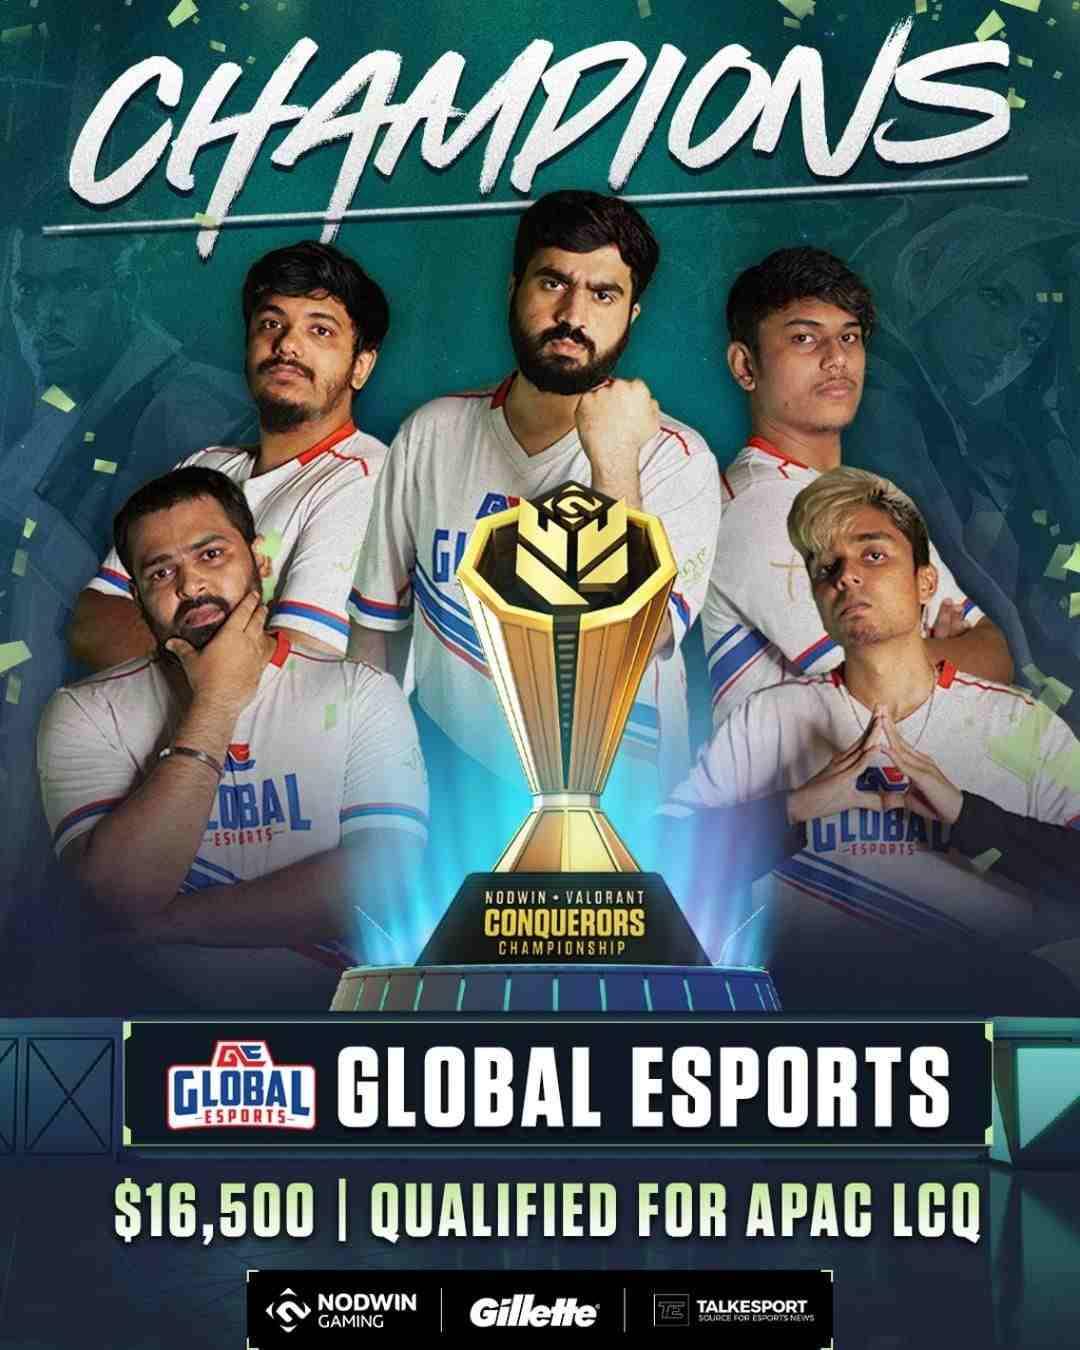 Global Esports To Thailand